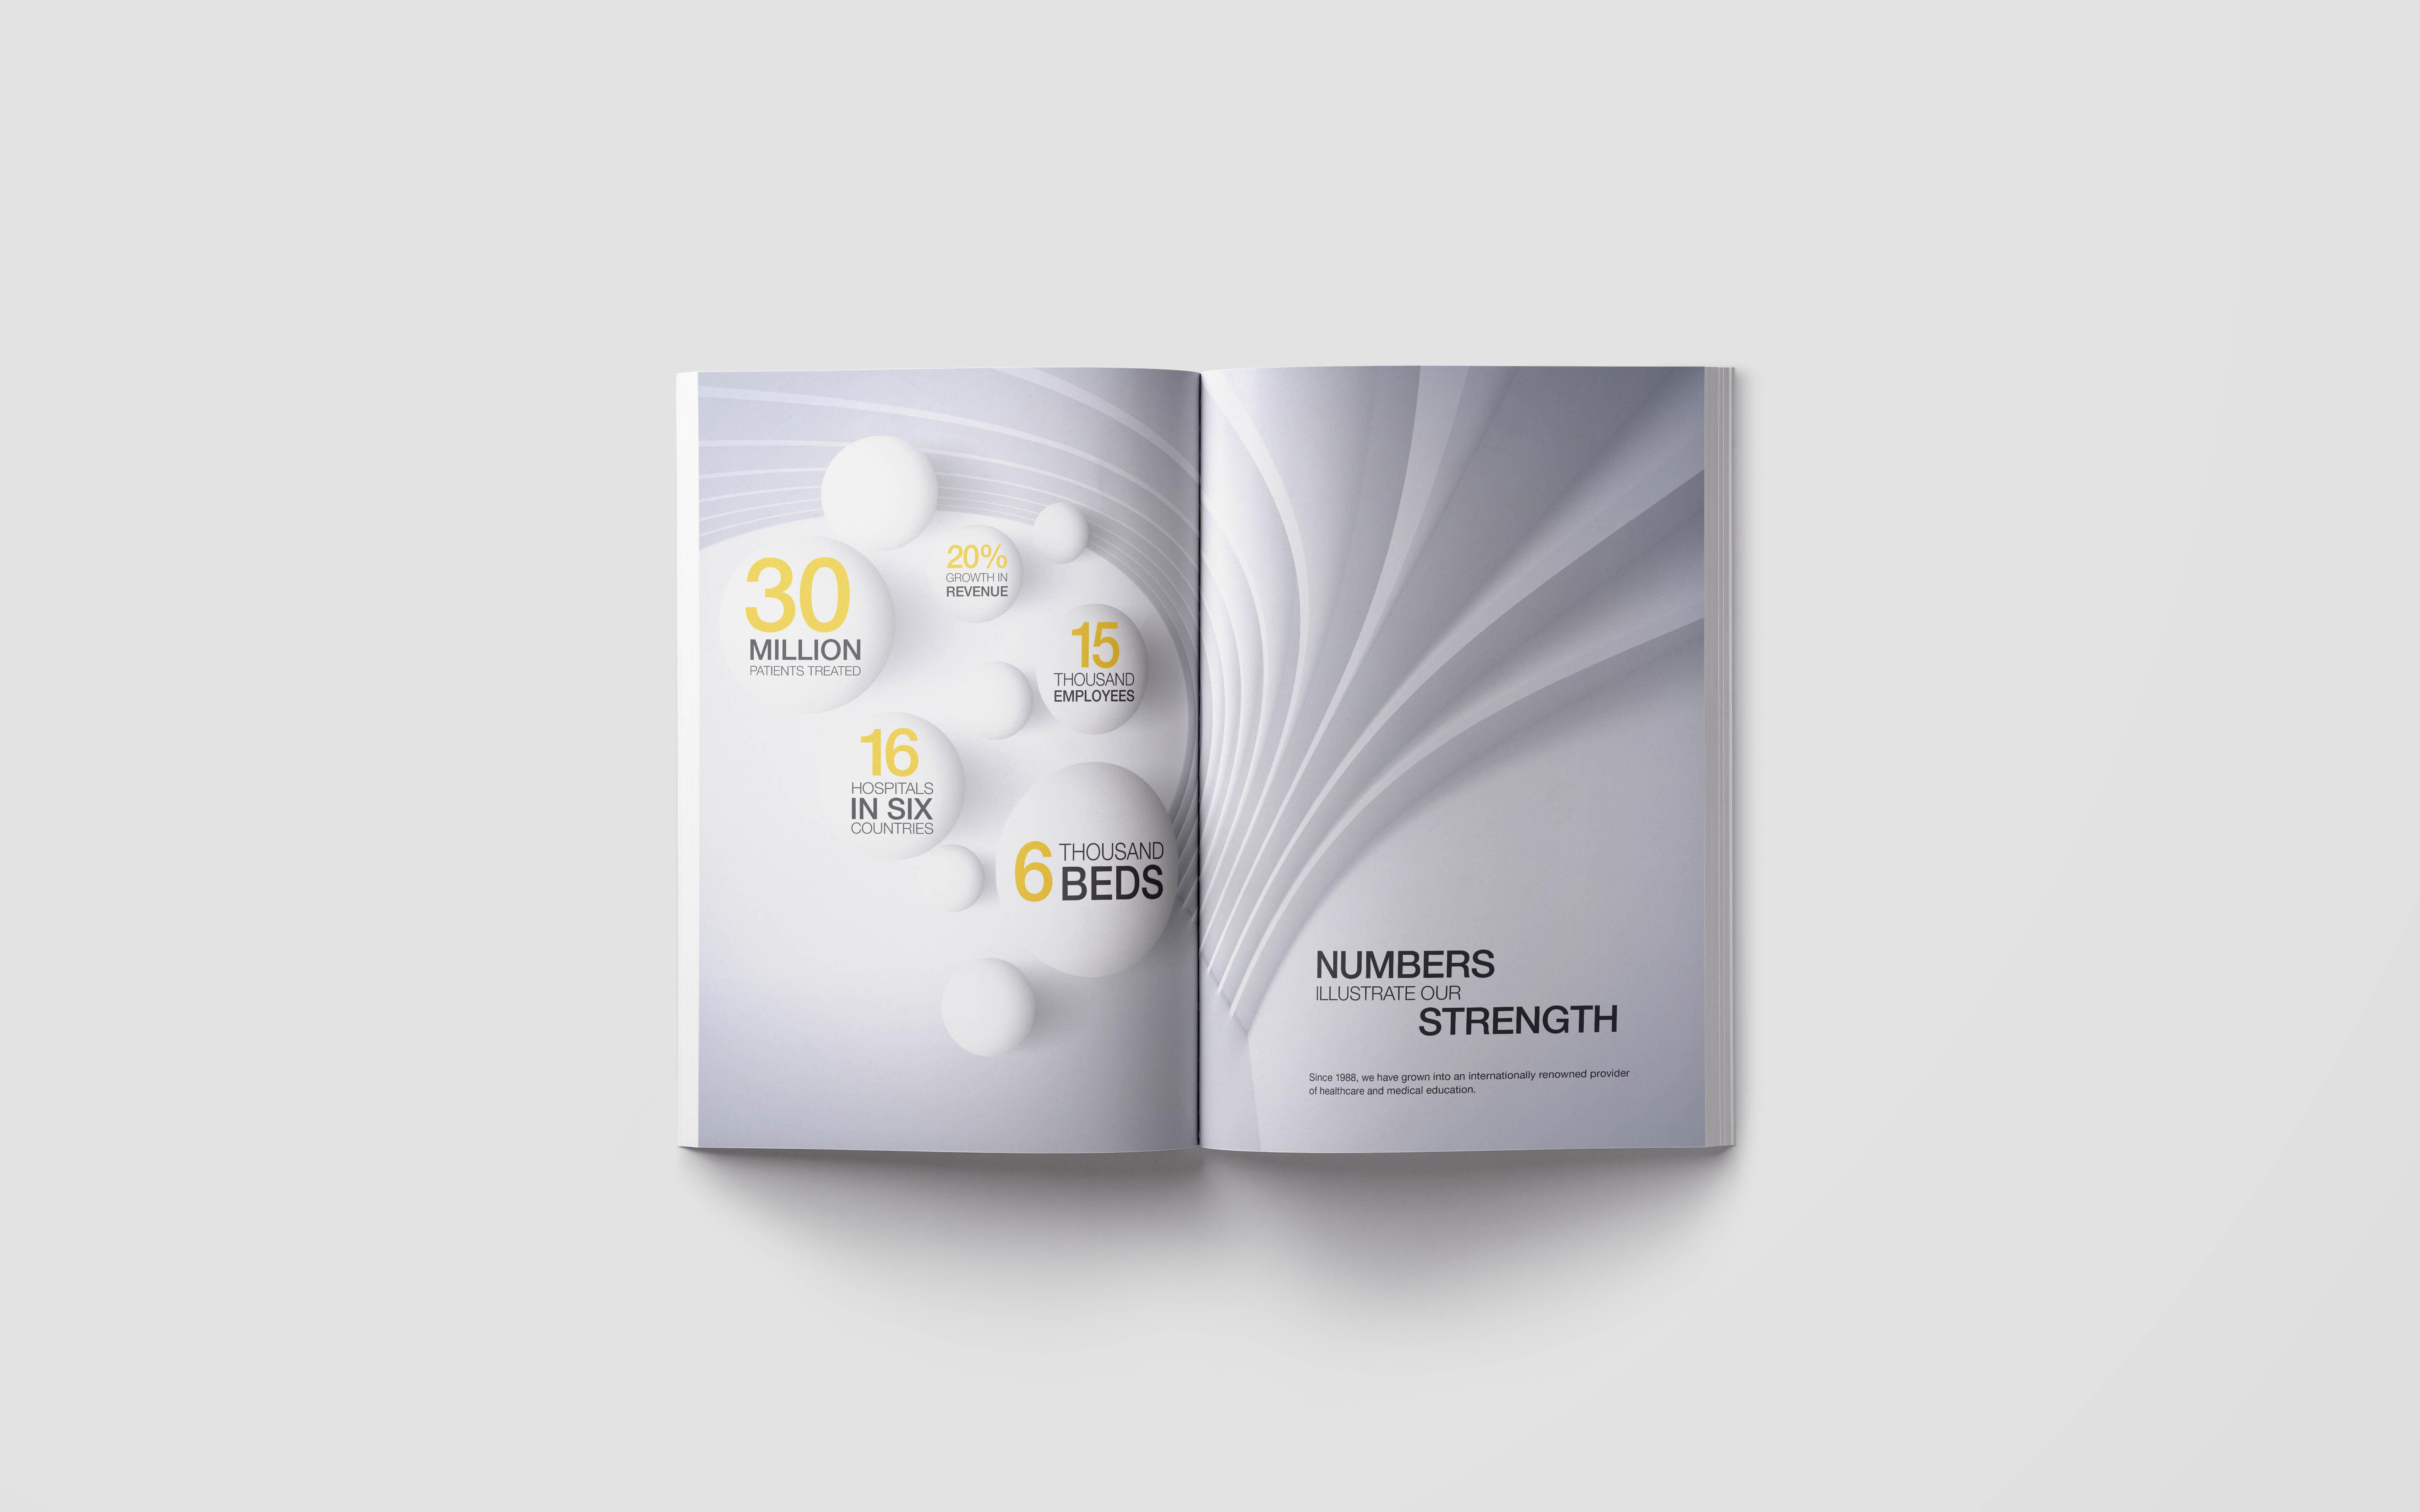 009_AlBatarjee_Corporate Profile